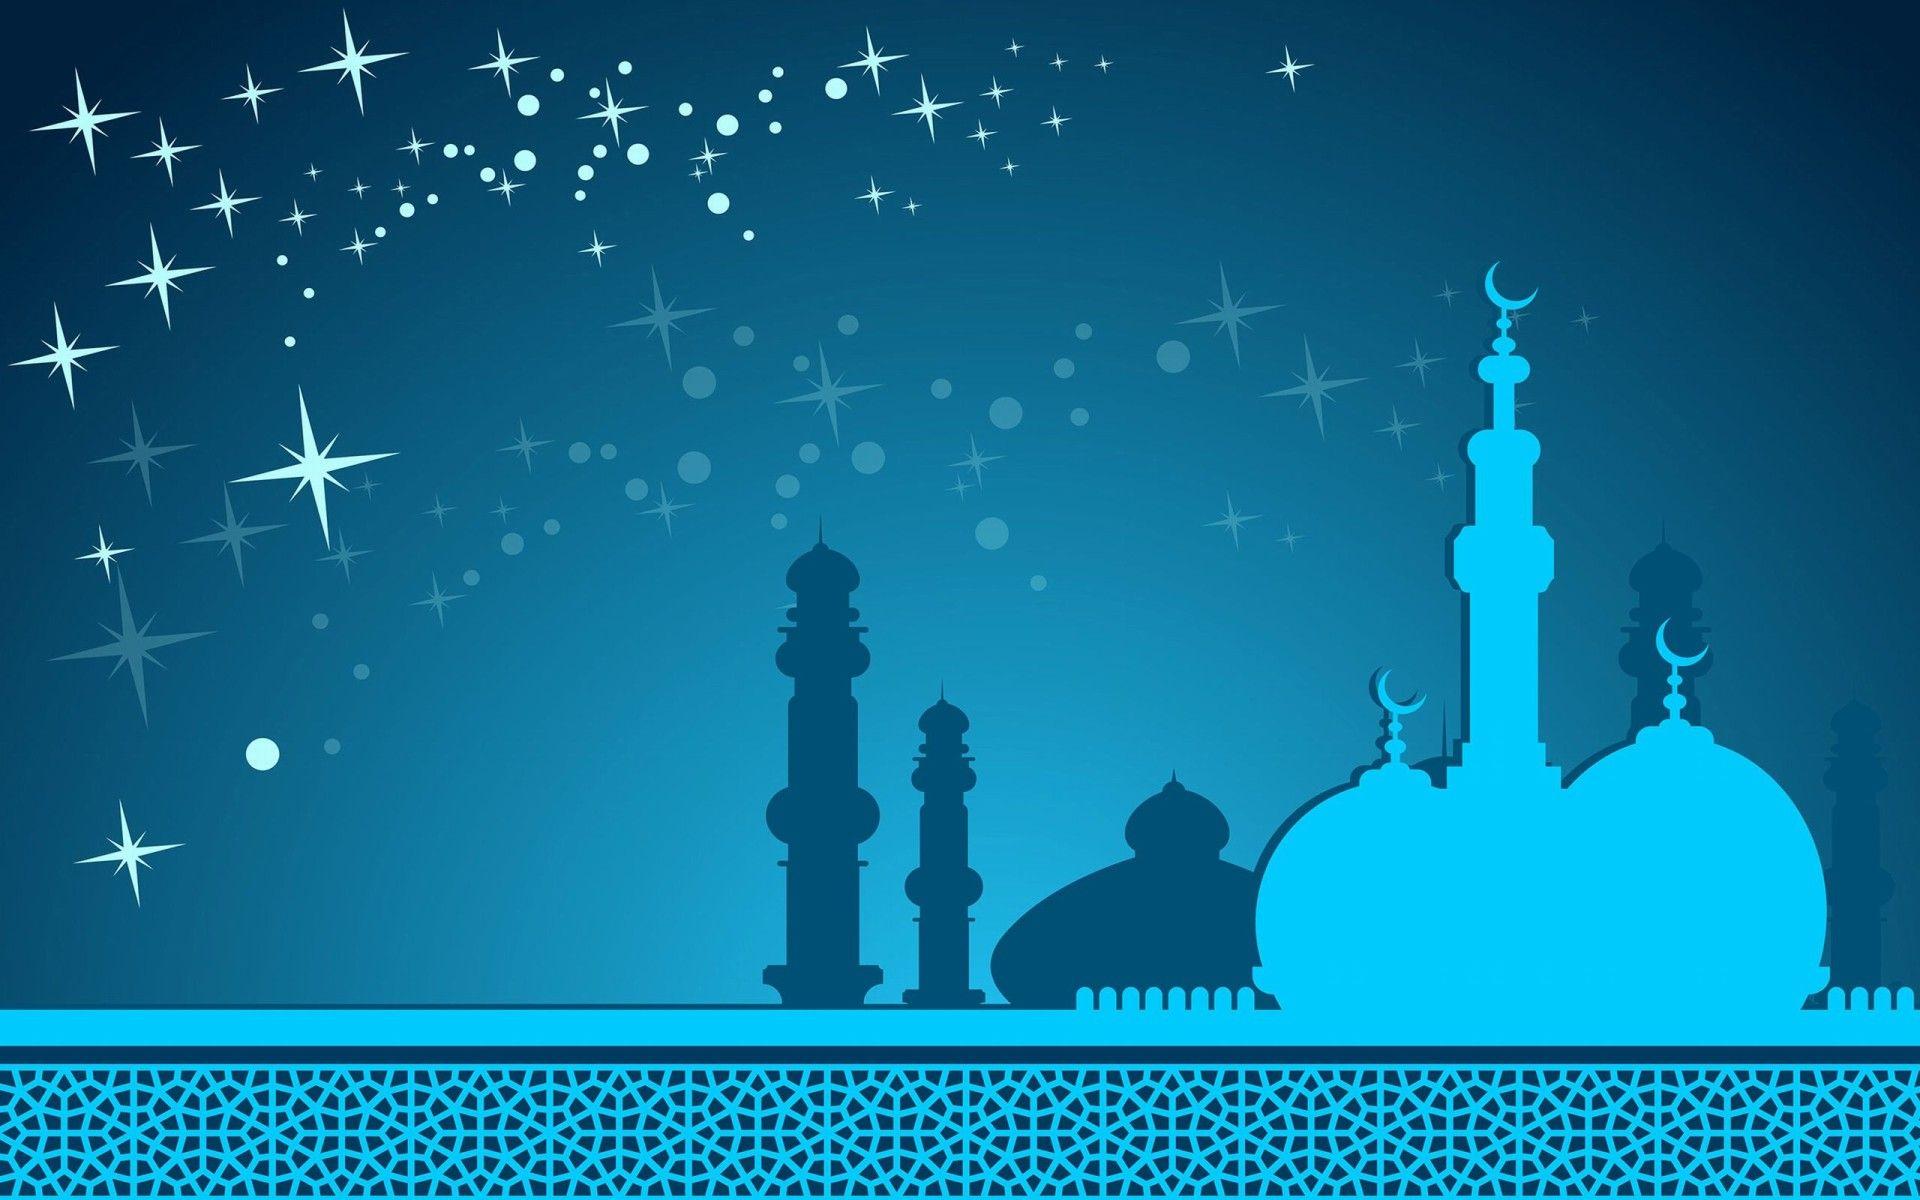 Full HD Animated Mosque Beautiful Desktop Wallpaper